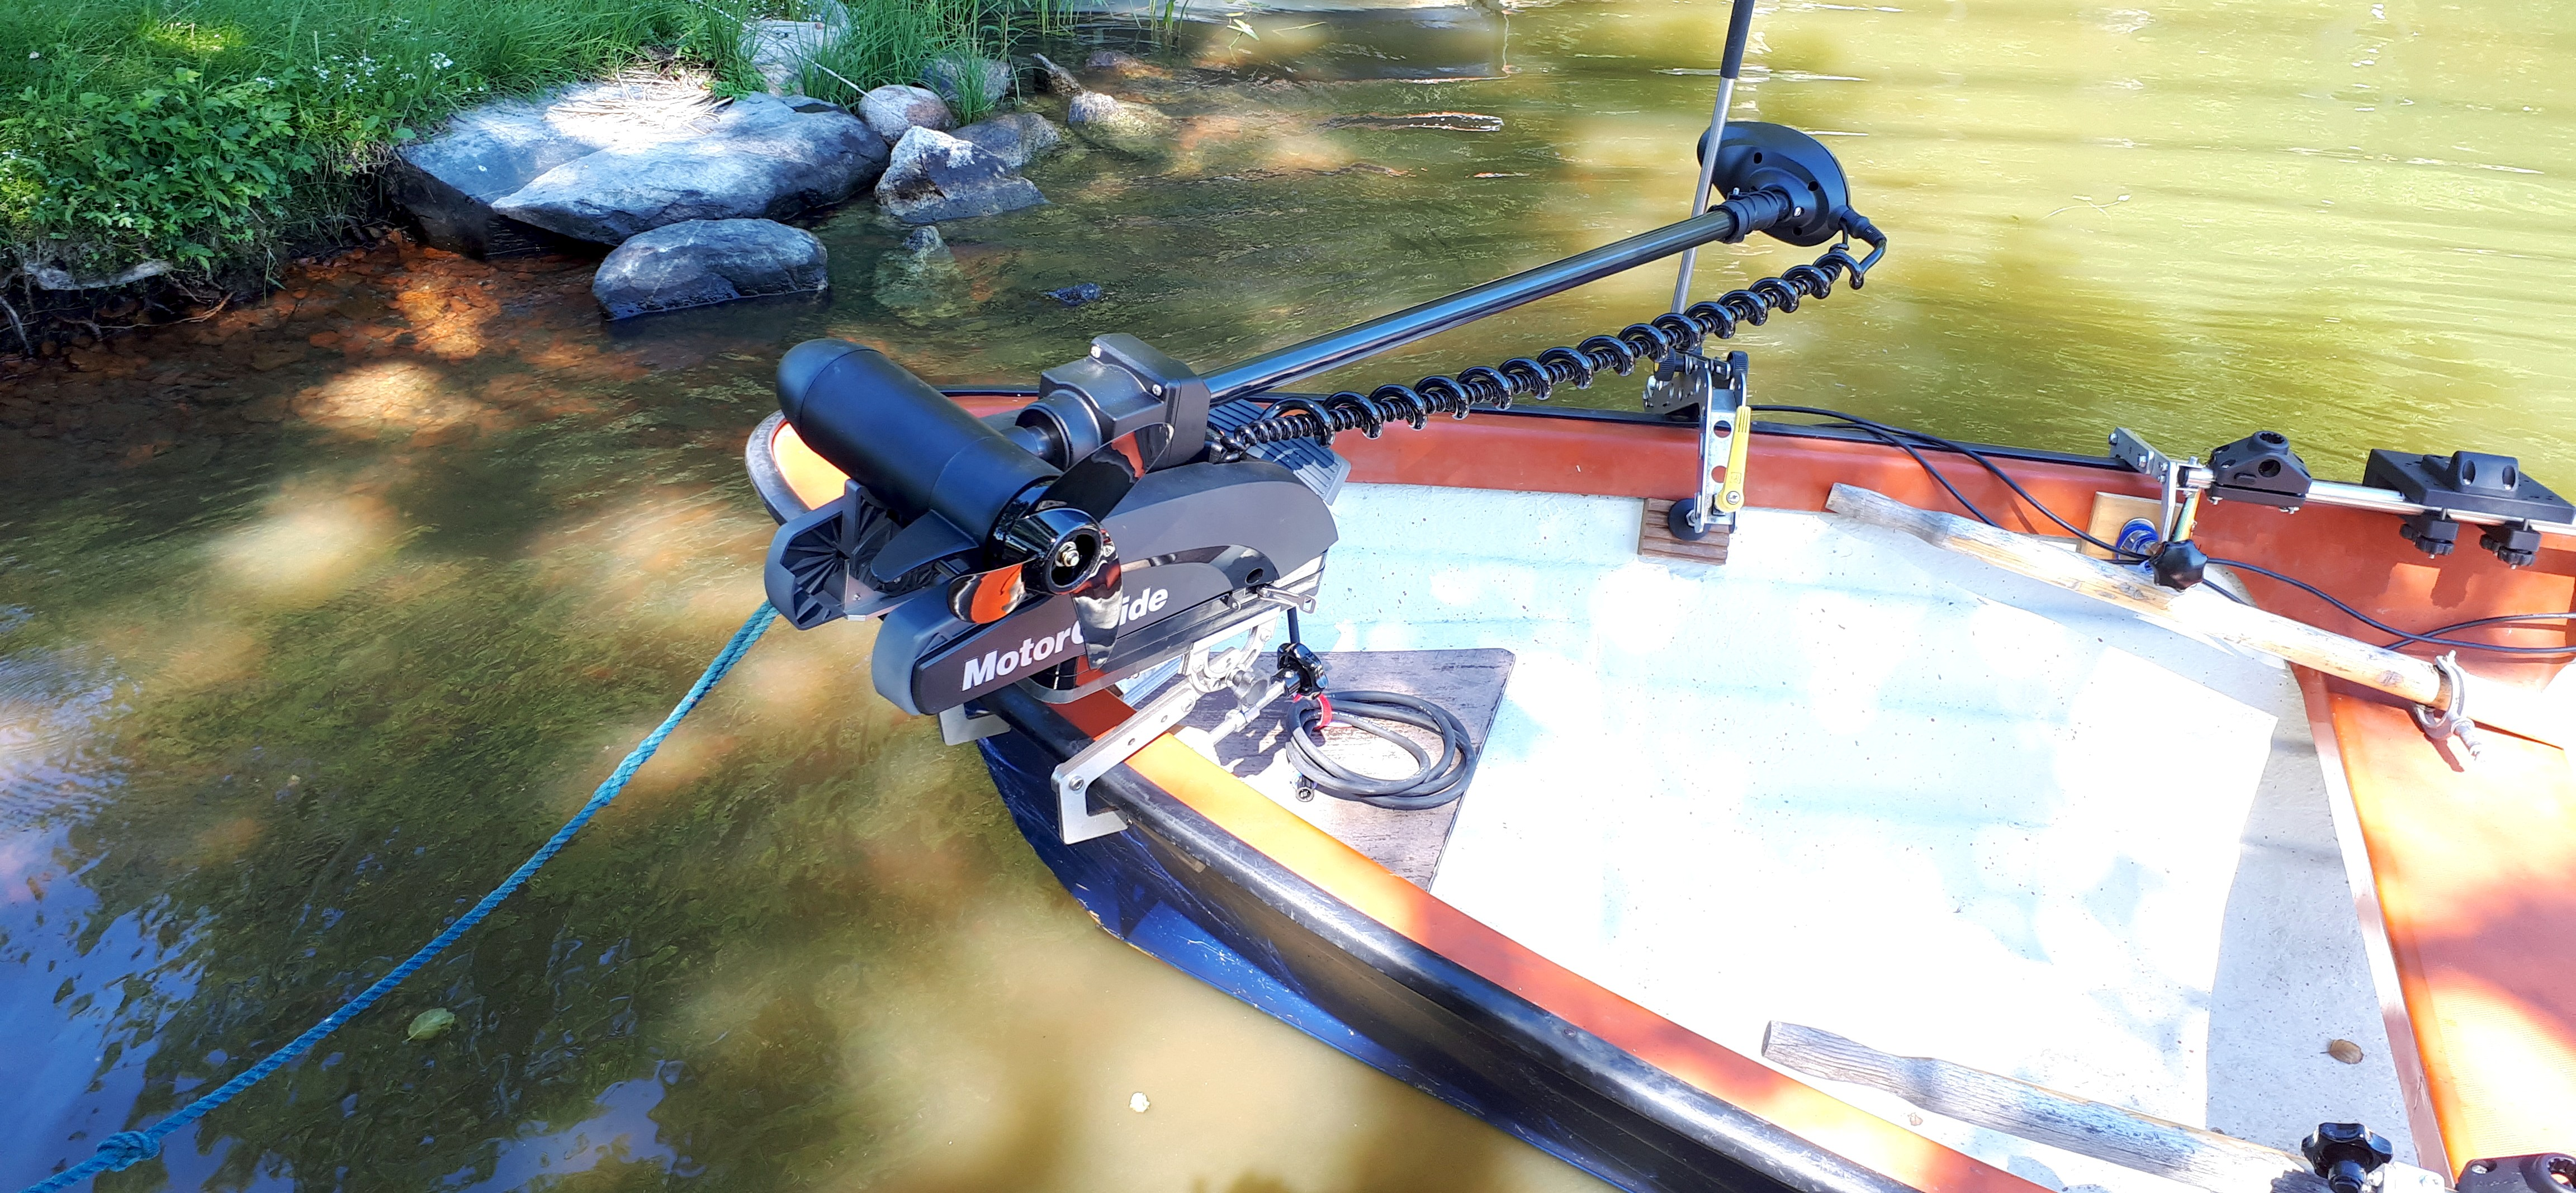 Spinnfischen in Schweden GPS-gesteuerter elektrischer Bugmotor Minn Kota Motorguide Bootsklammer Boot-Befestigung Bootshalterung